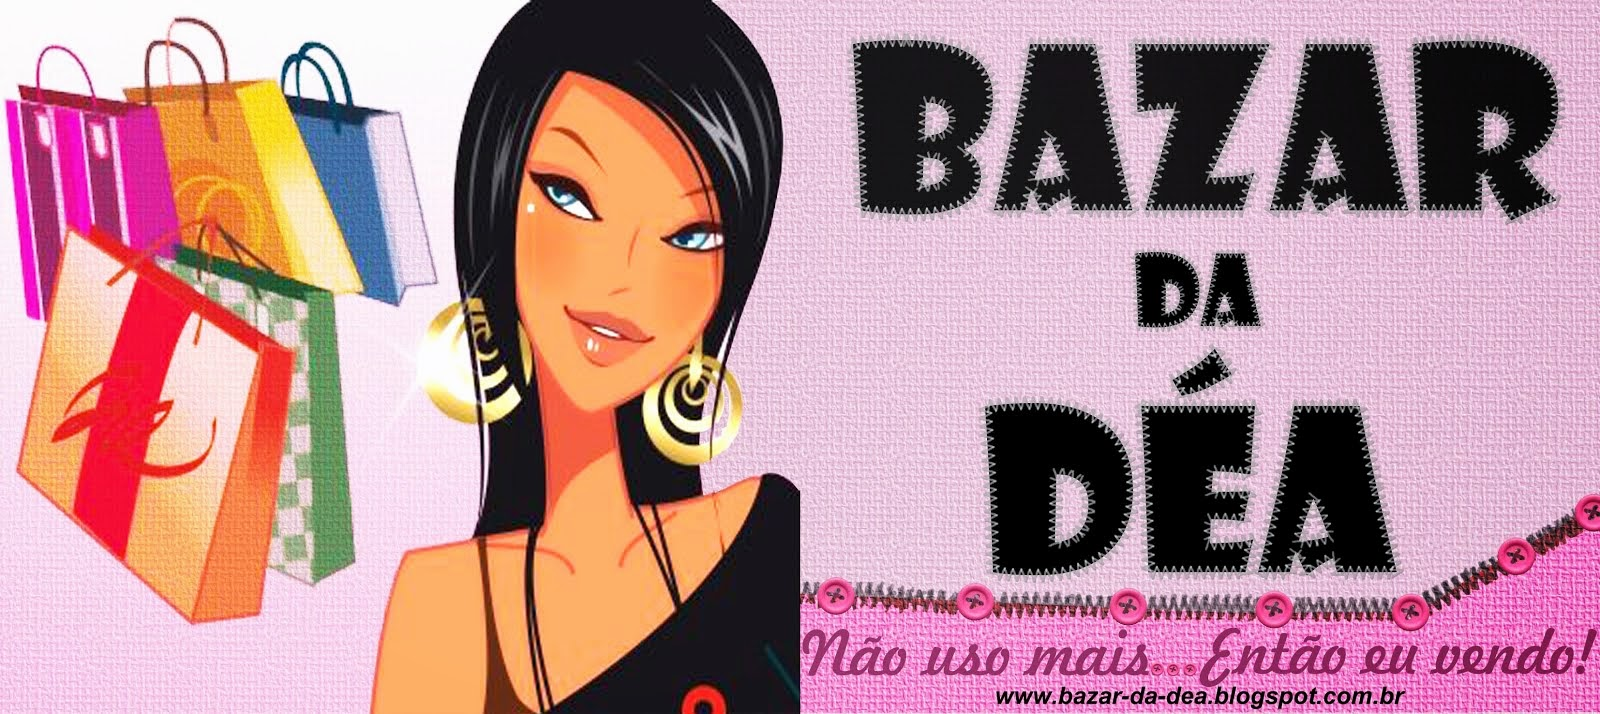 Bazar da Déa